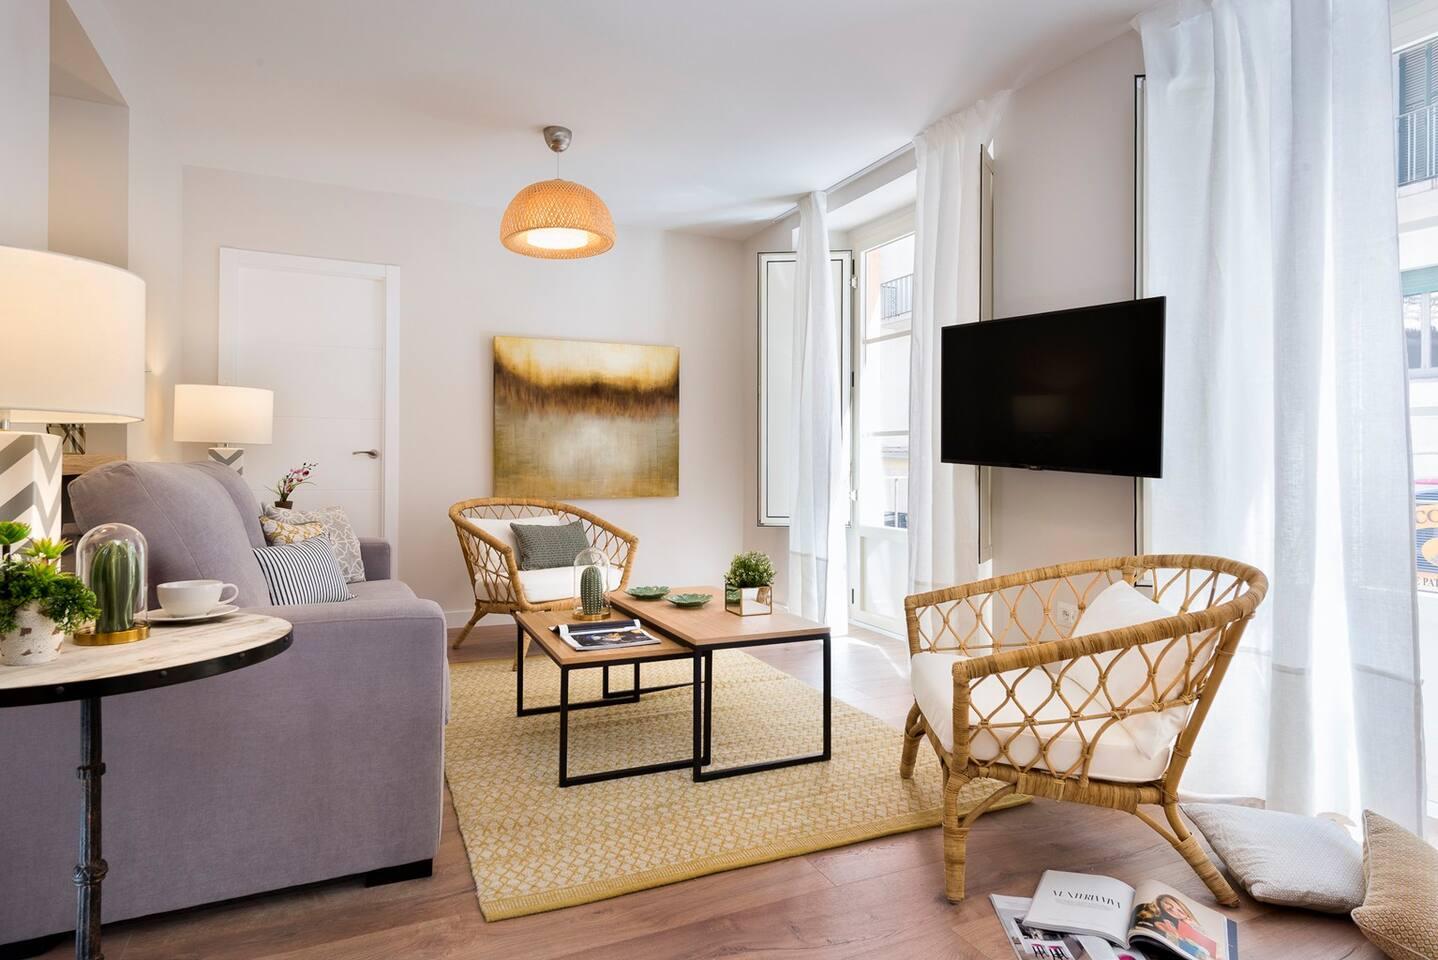 Caldereria 2 - Apartamento de lujo en Málaga